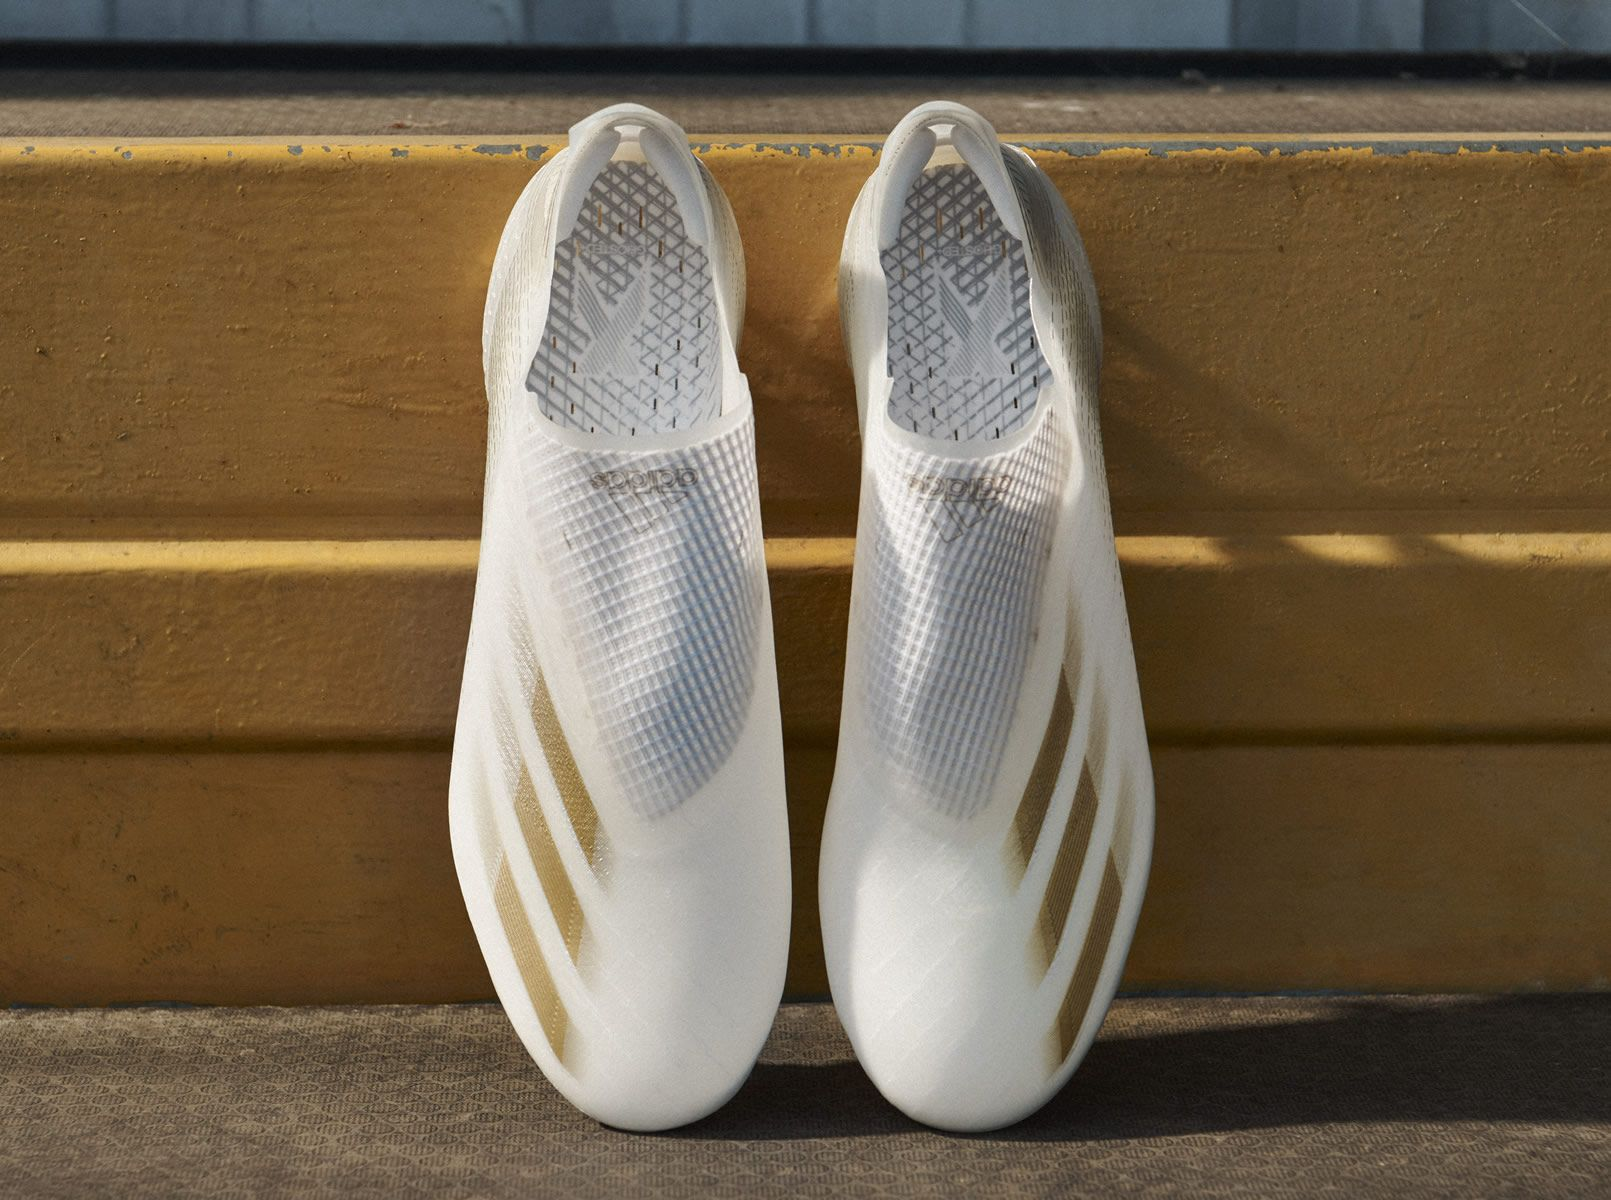 Nuevos botines X Ghosted | Imagen adidas